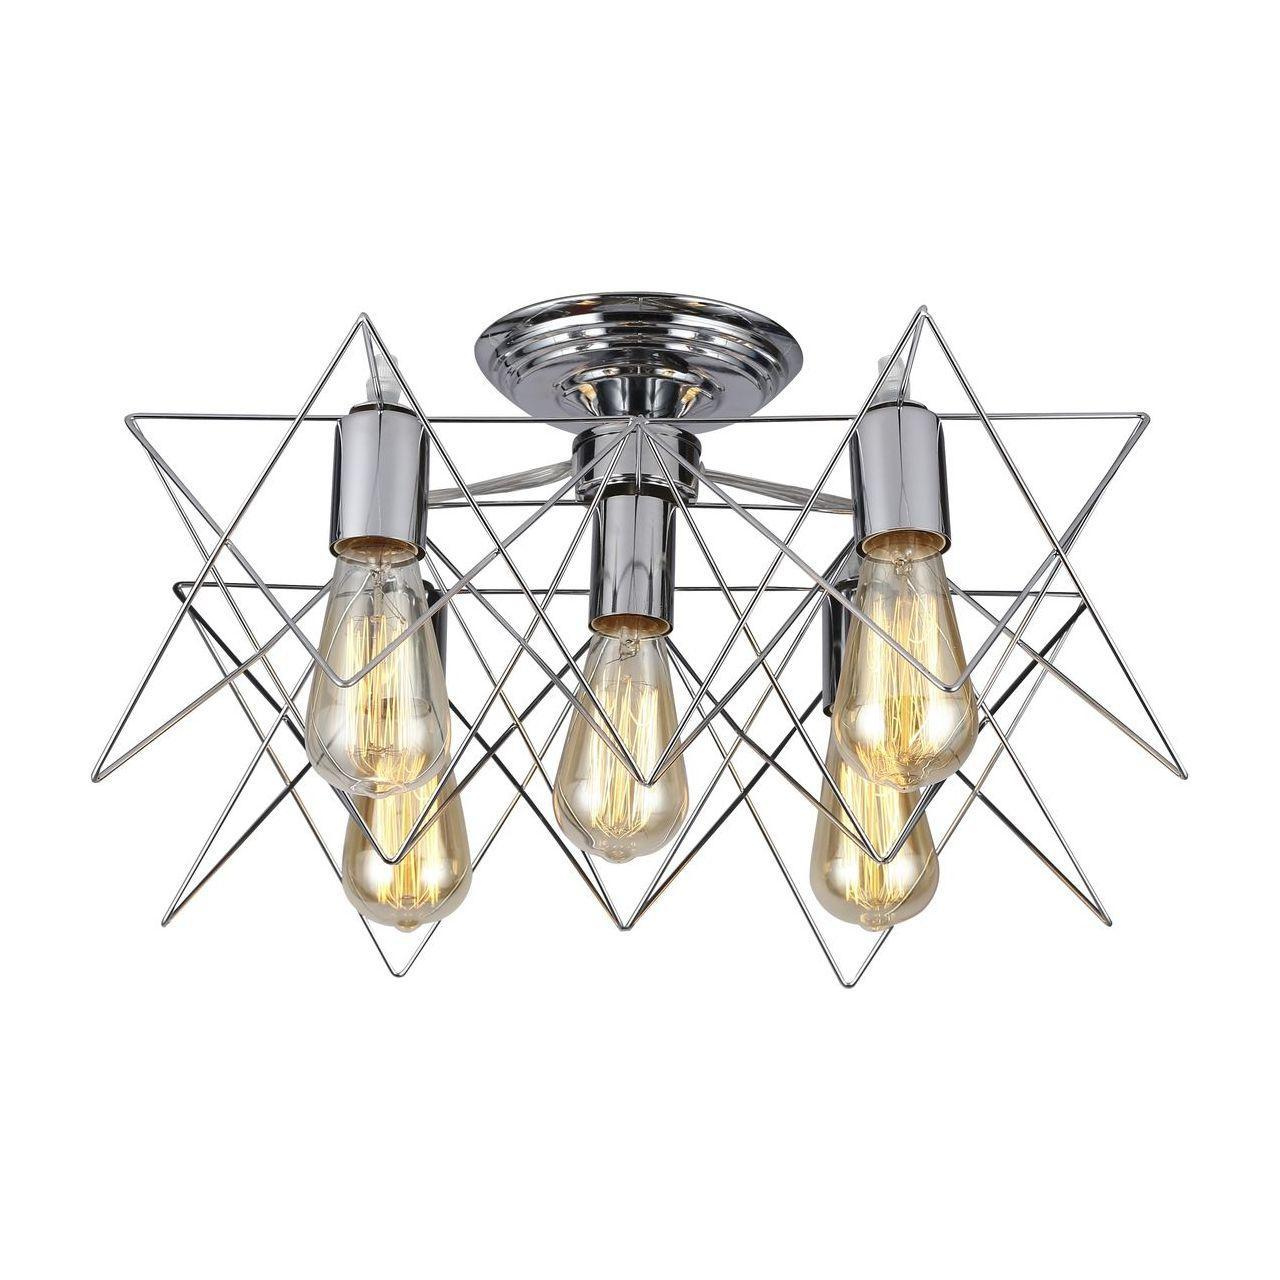 Люстра Arte Lamp A6048PL-5CC потолочная потолочная люстра arte lamp glassy арт a8240pl 5cc